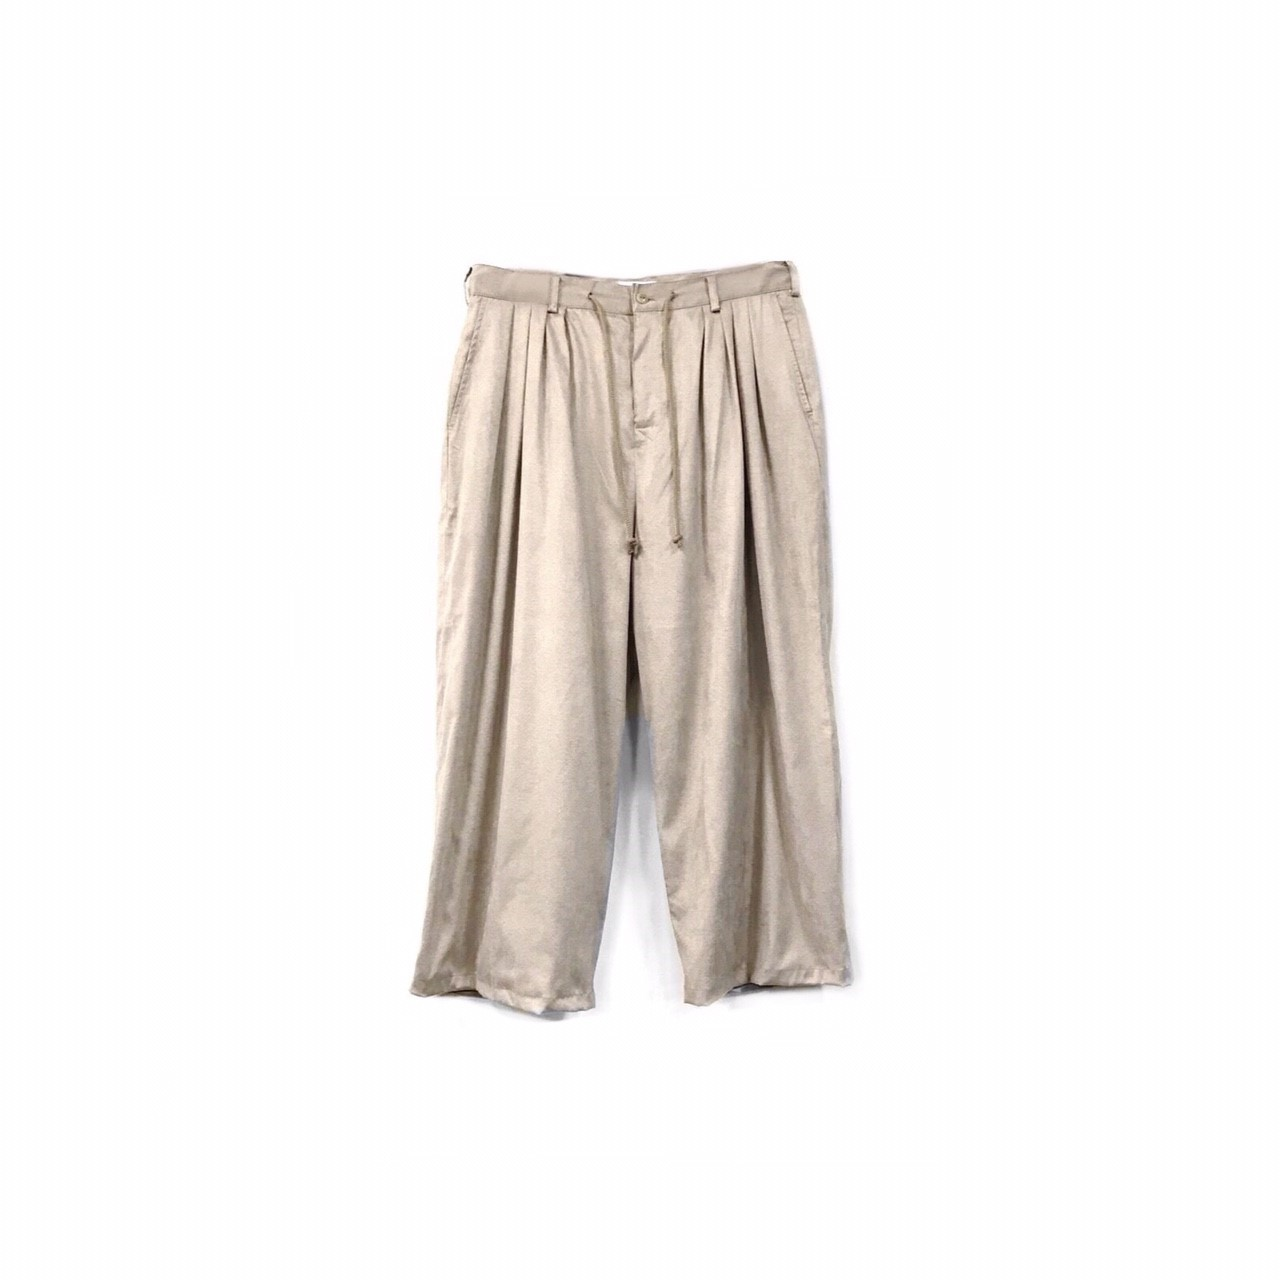 yotsuba - Fake Suede 4tuck Wide Pants / Beige ¥26000+tax